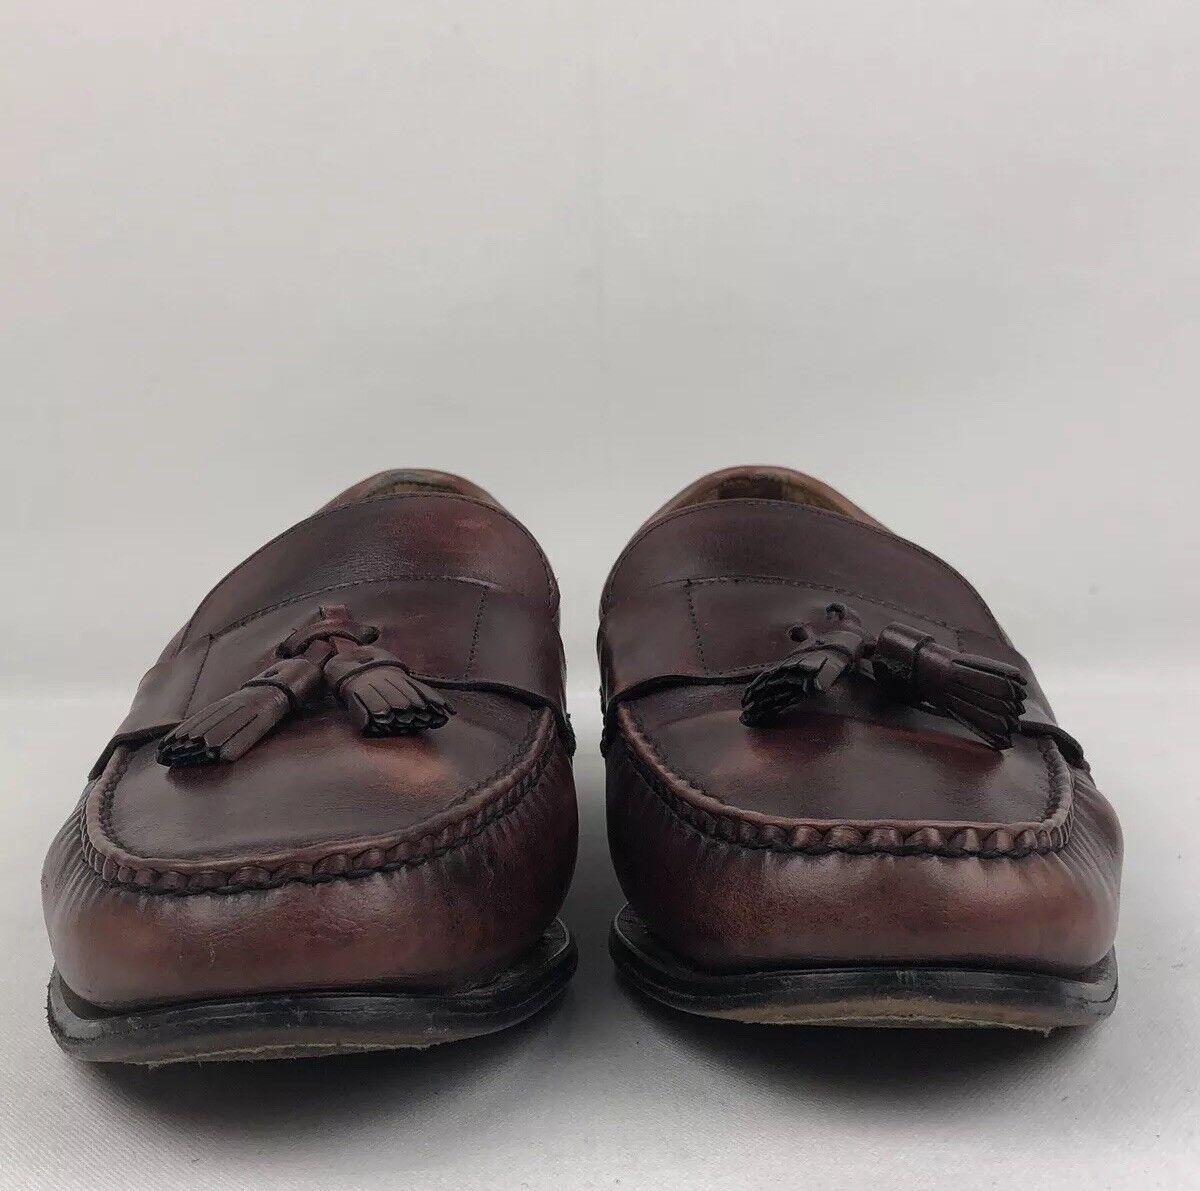 Allen Edmonds Schreier Loafers Cognac Brown Leather Mens SZ 14 D46